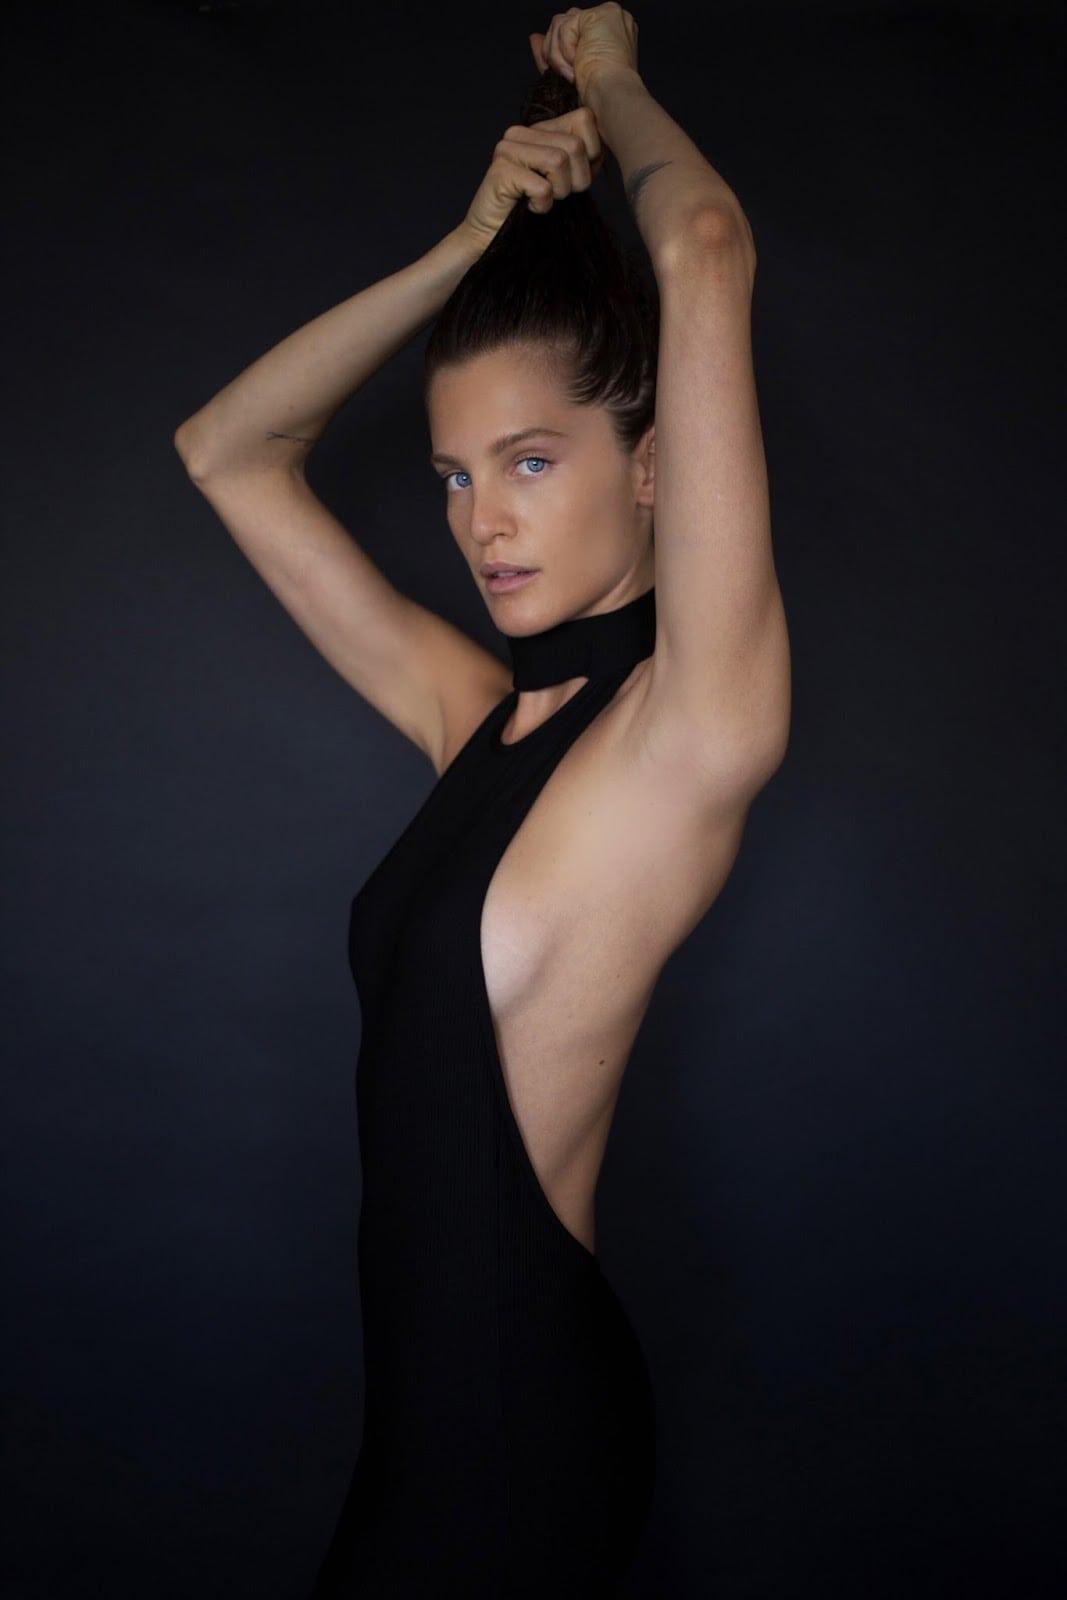 Liz Solari nude (86 photos), leaked Sideboobs, YouTube, panties 2020